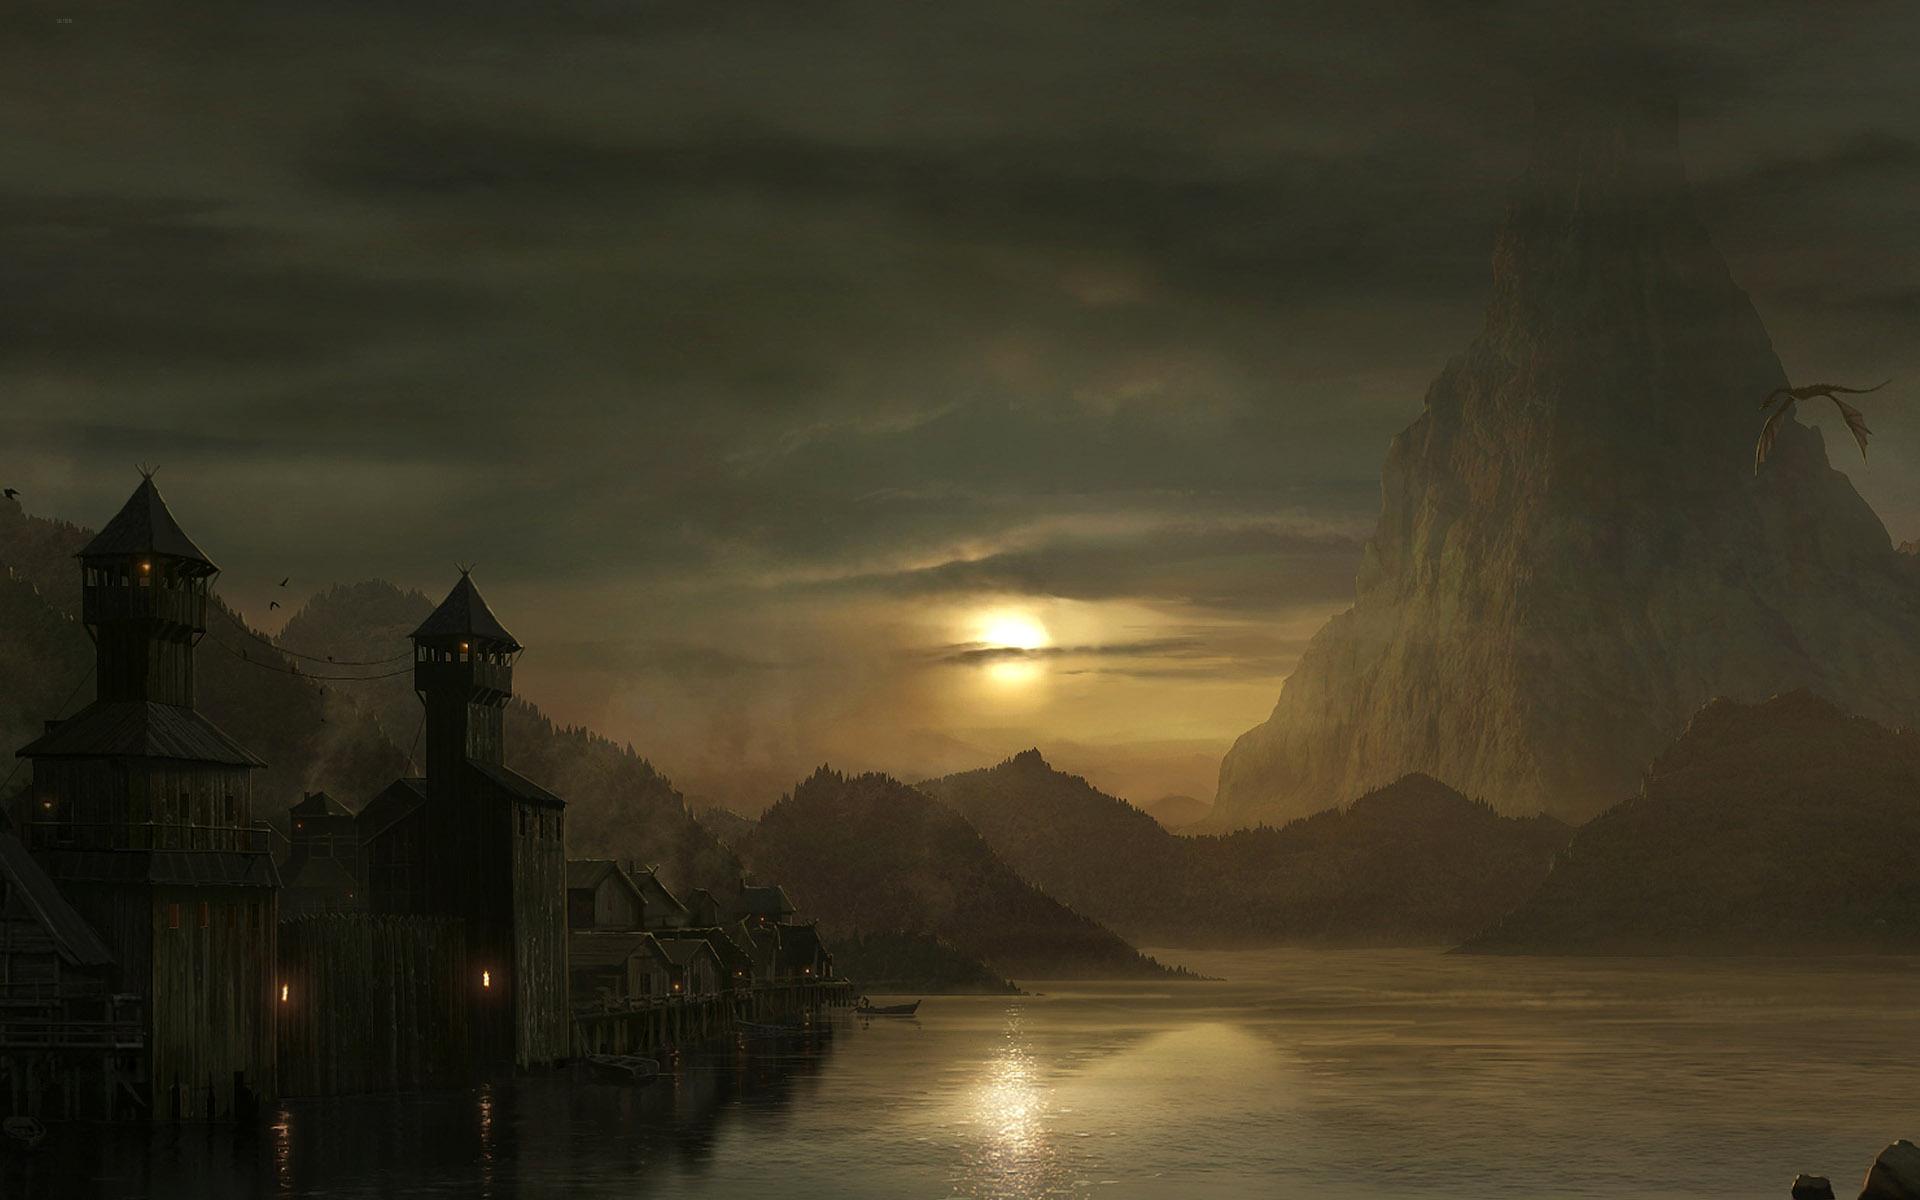 Dragon flying over the lake at dusk full hd wallpaper and - Fantasy game wallpaper ...